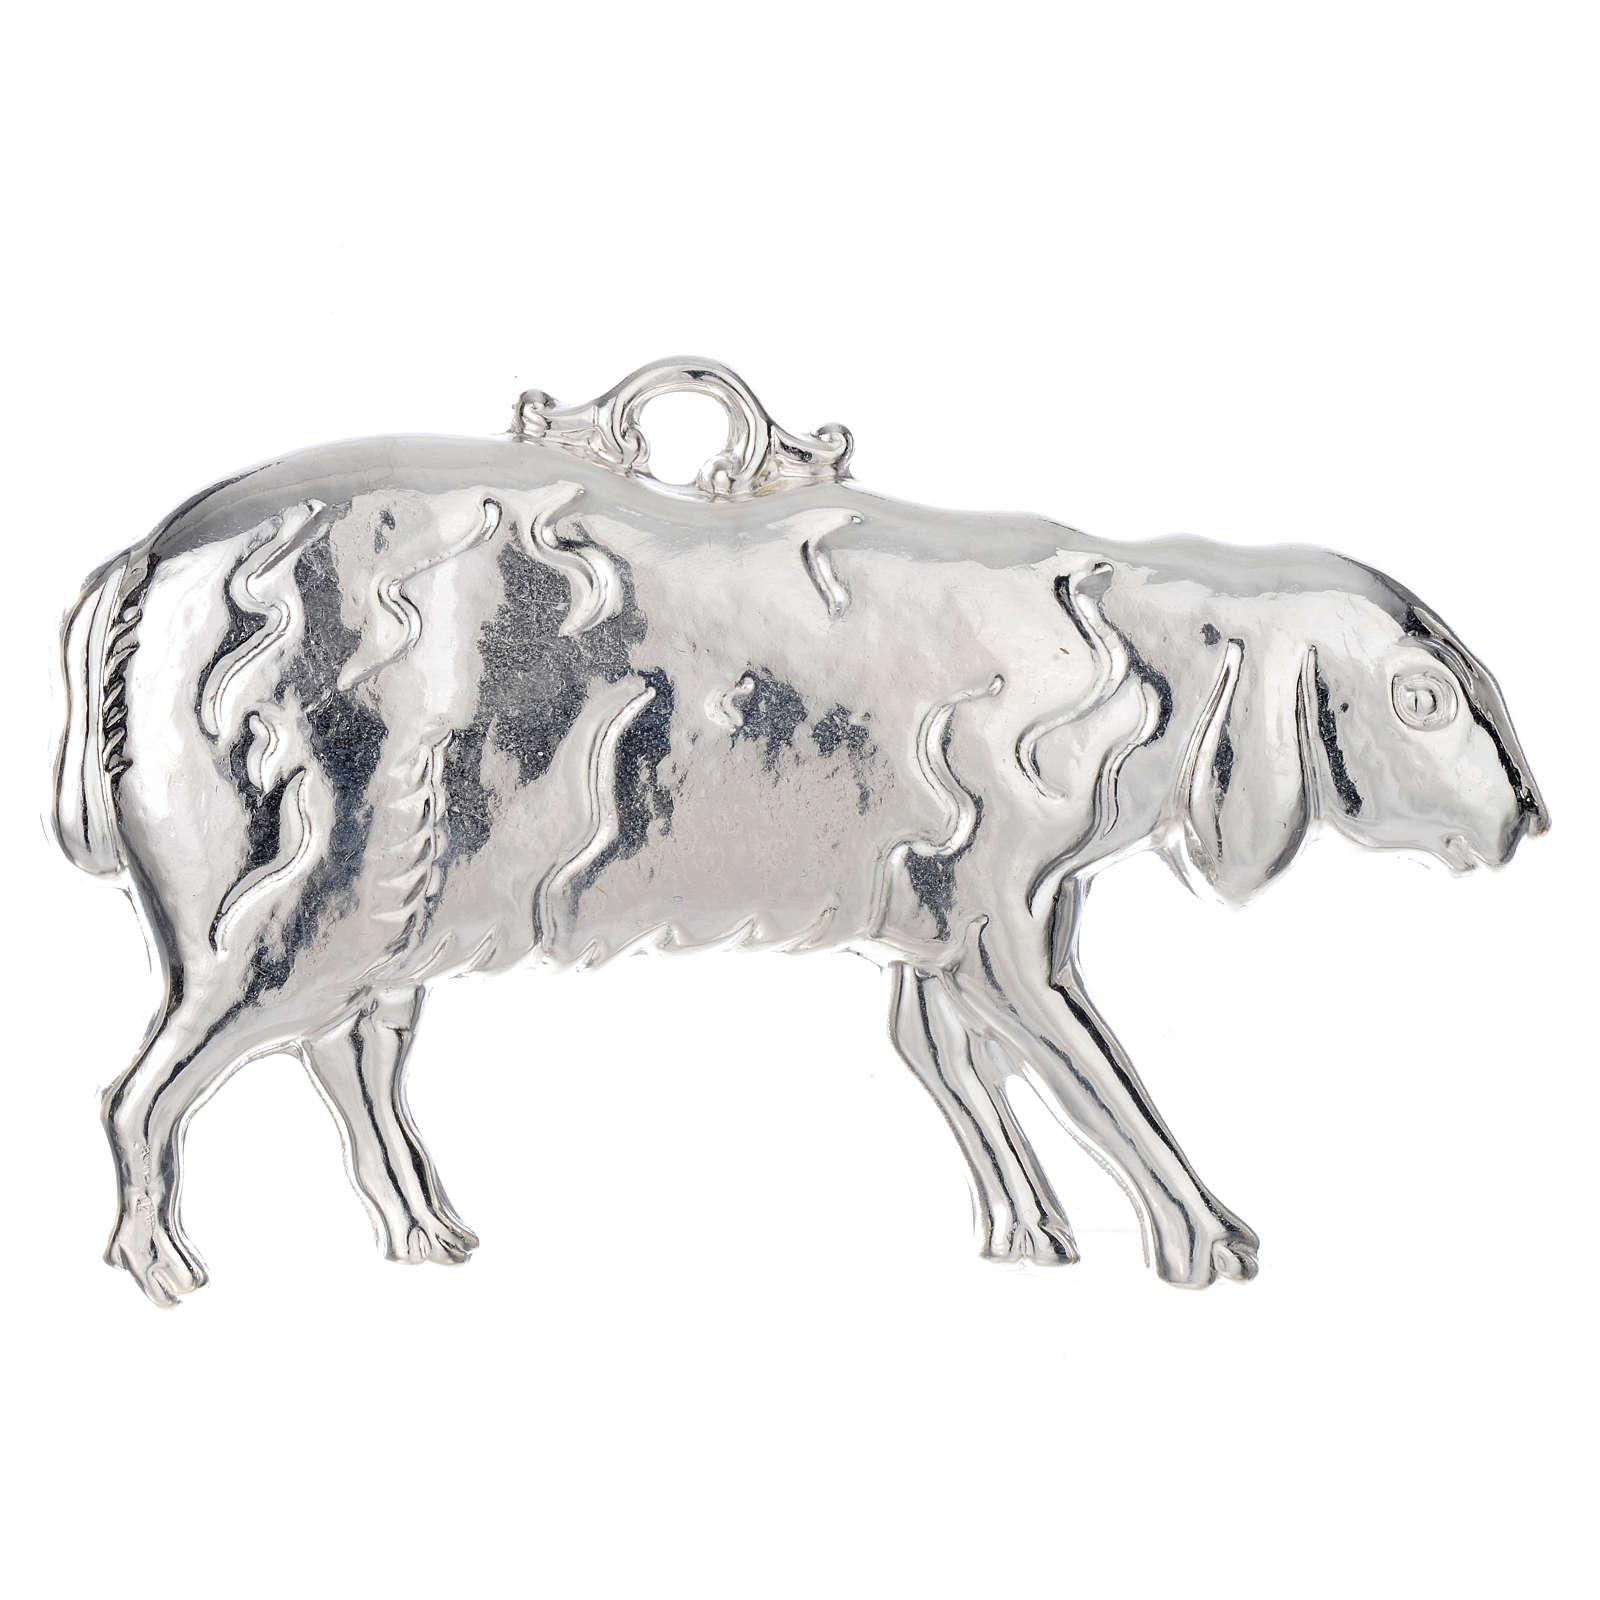 Ex-voto ovelha prata 925 ou metal 11x6 cm 3